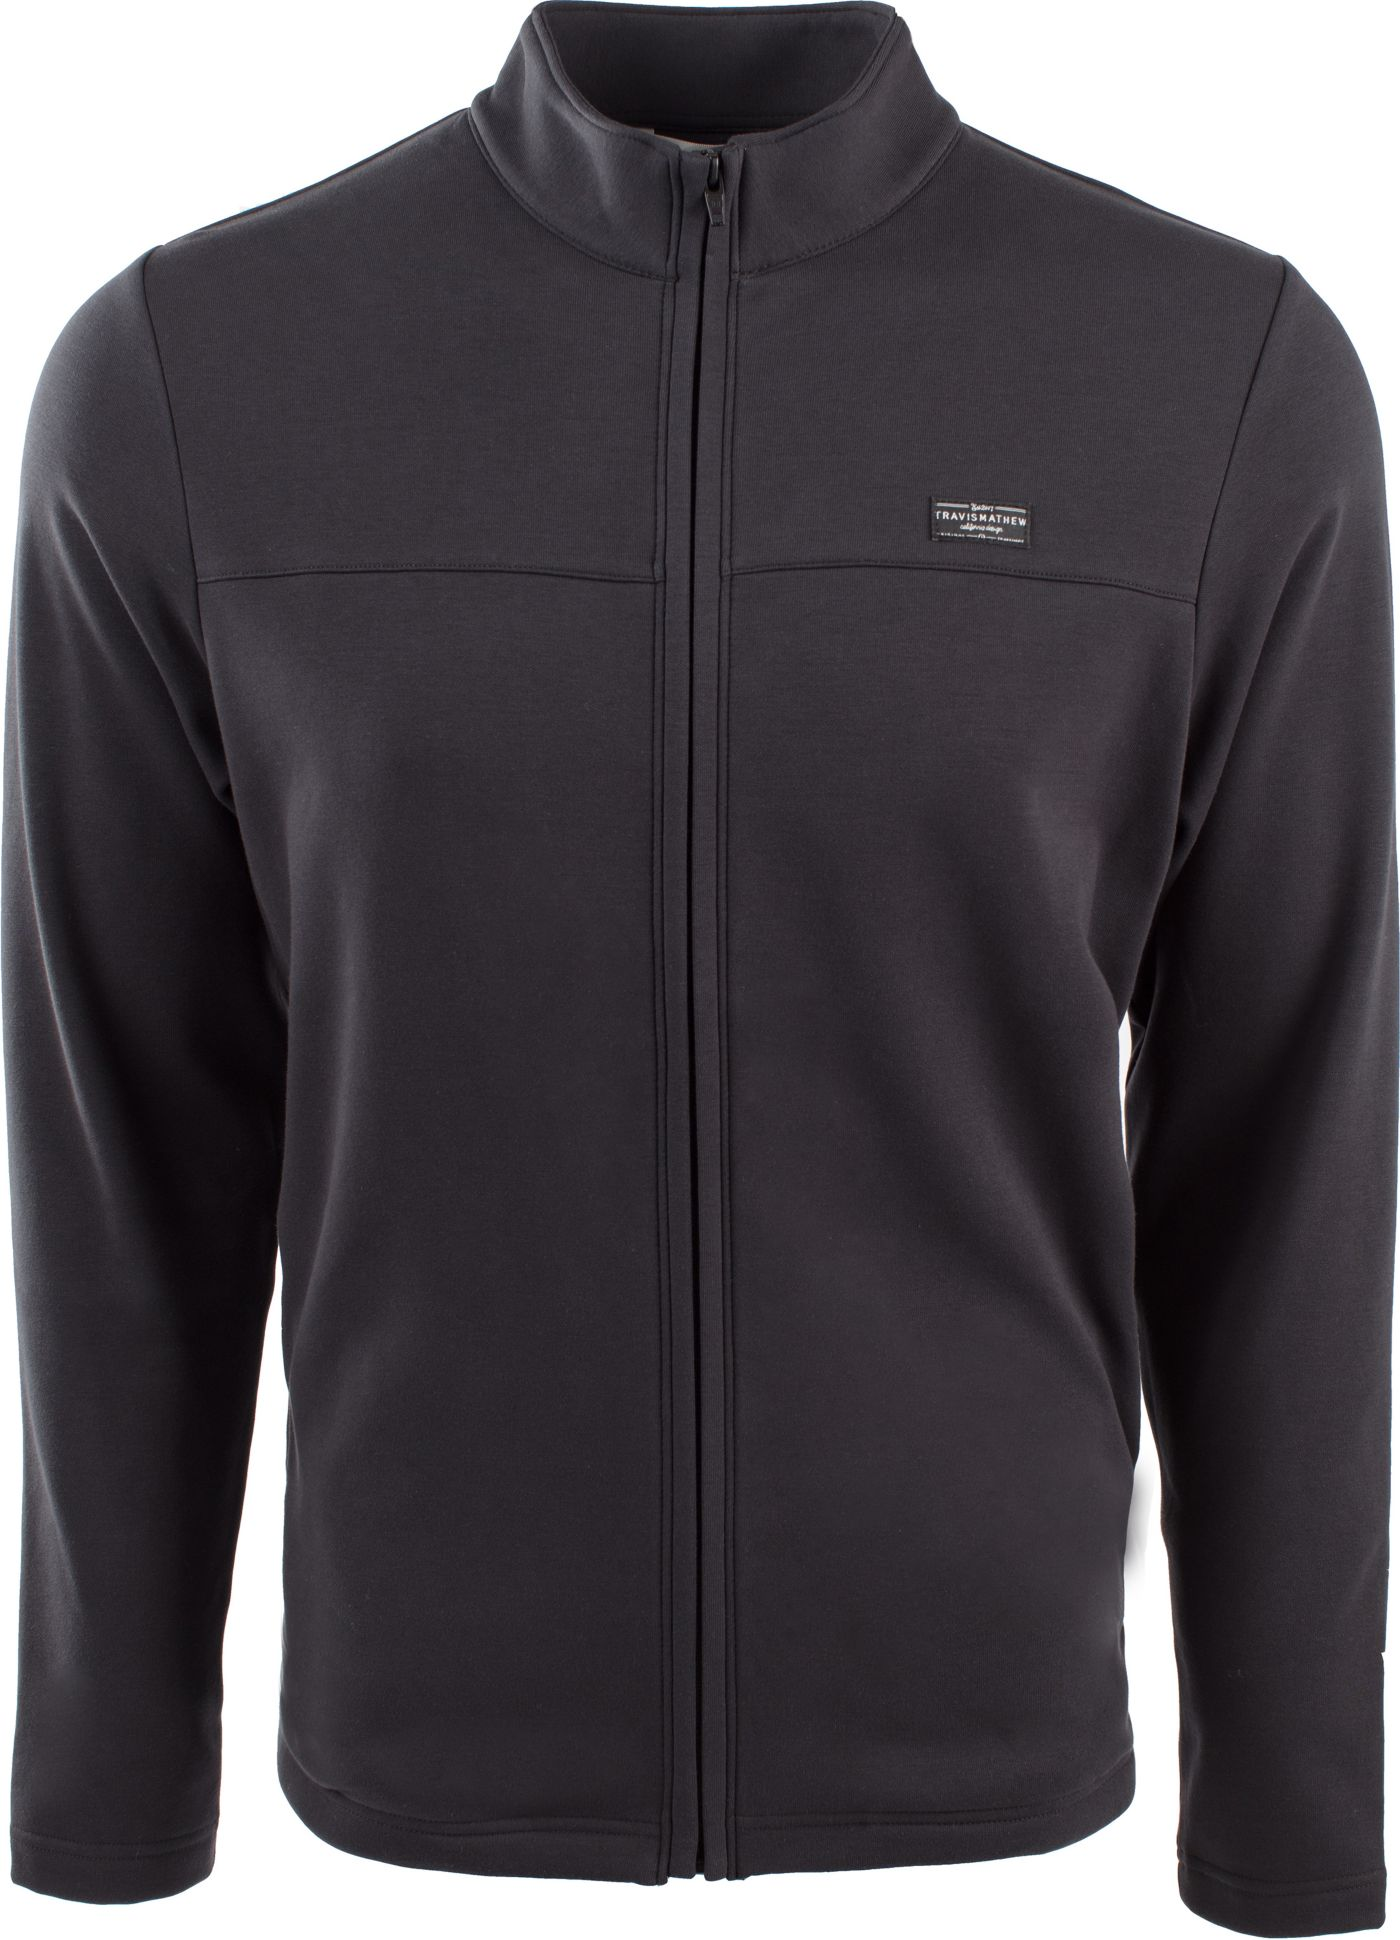 TravisMathew Men's Koozie Golf Jacket